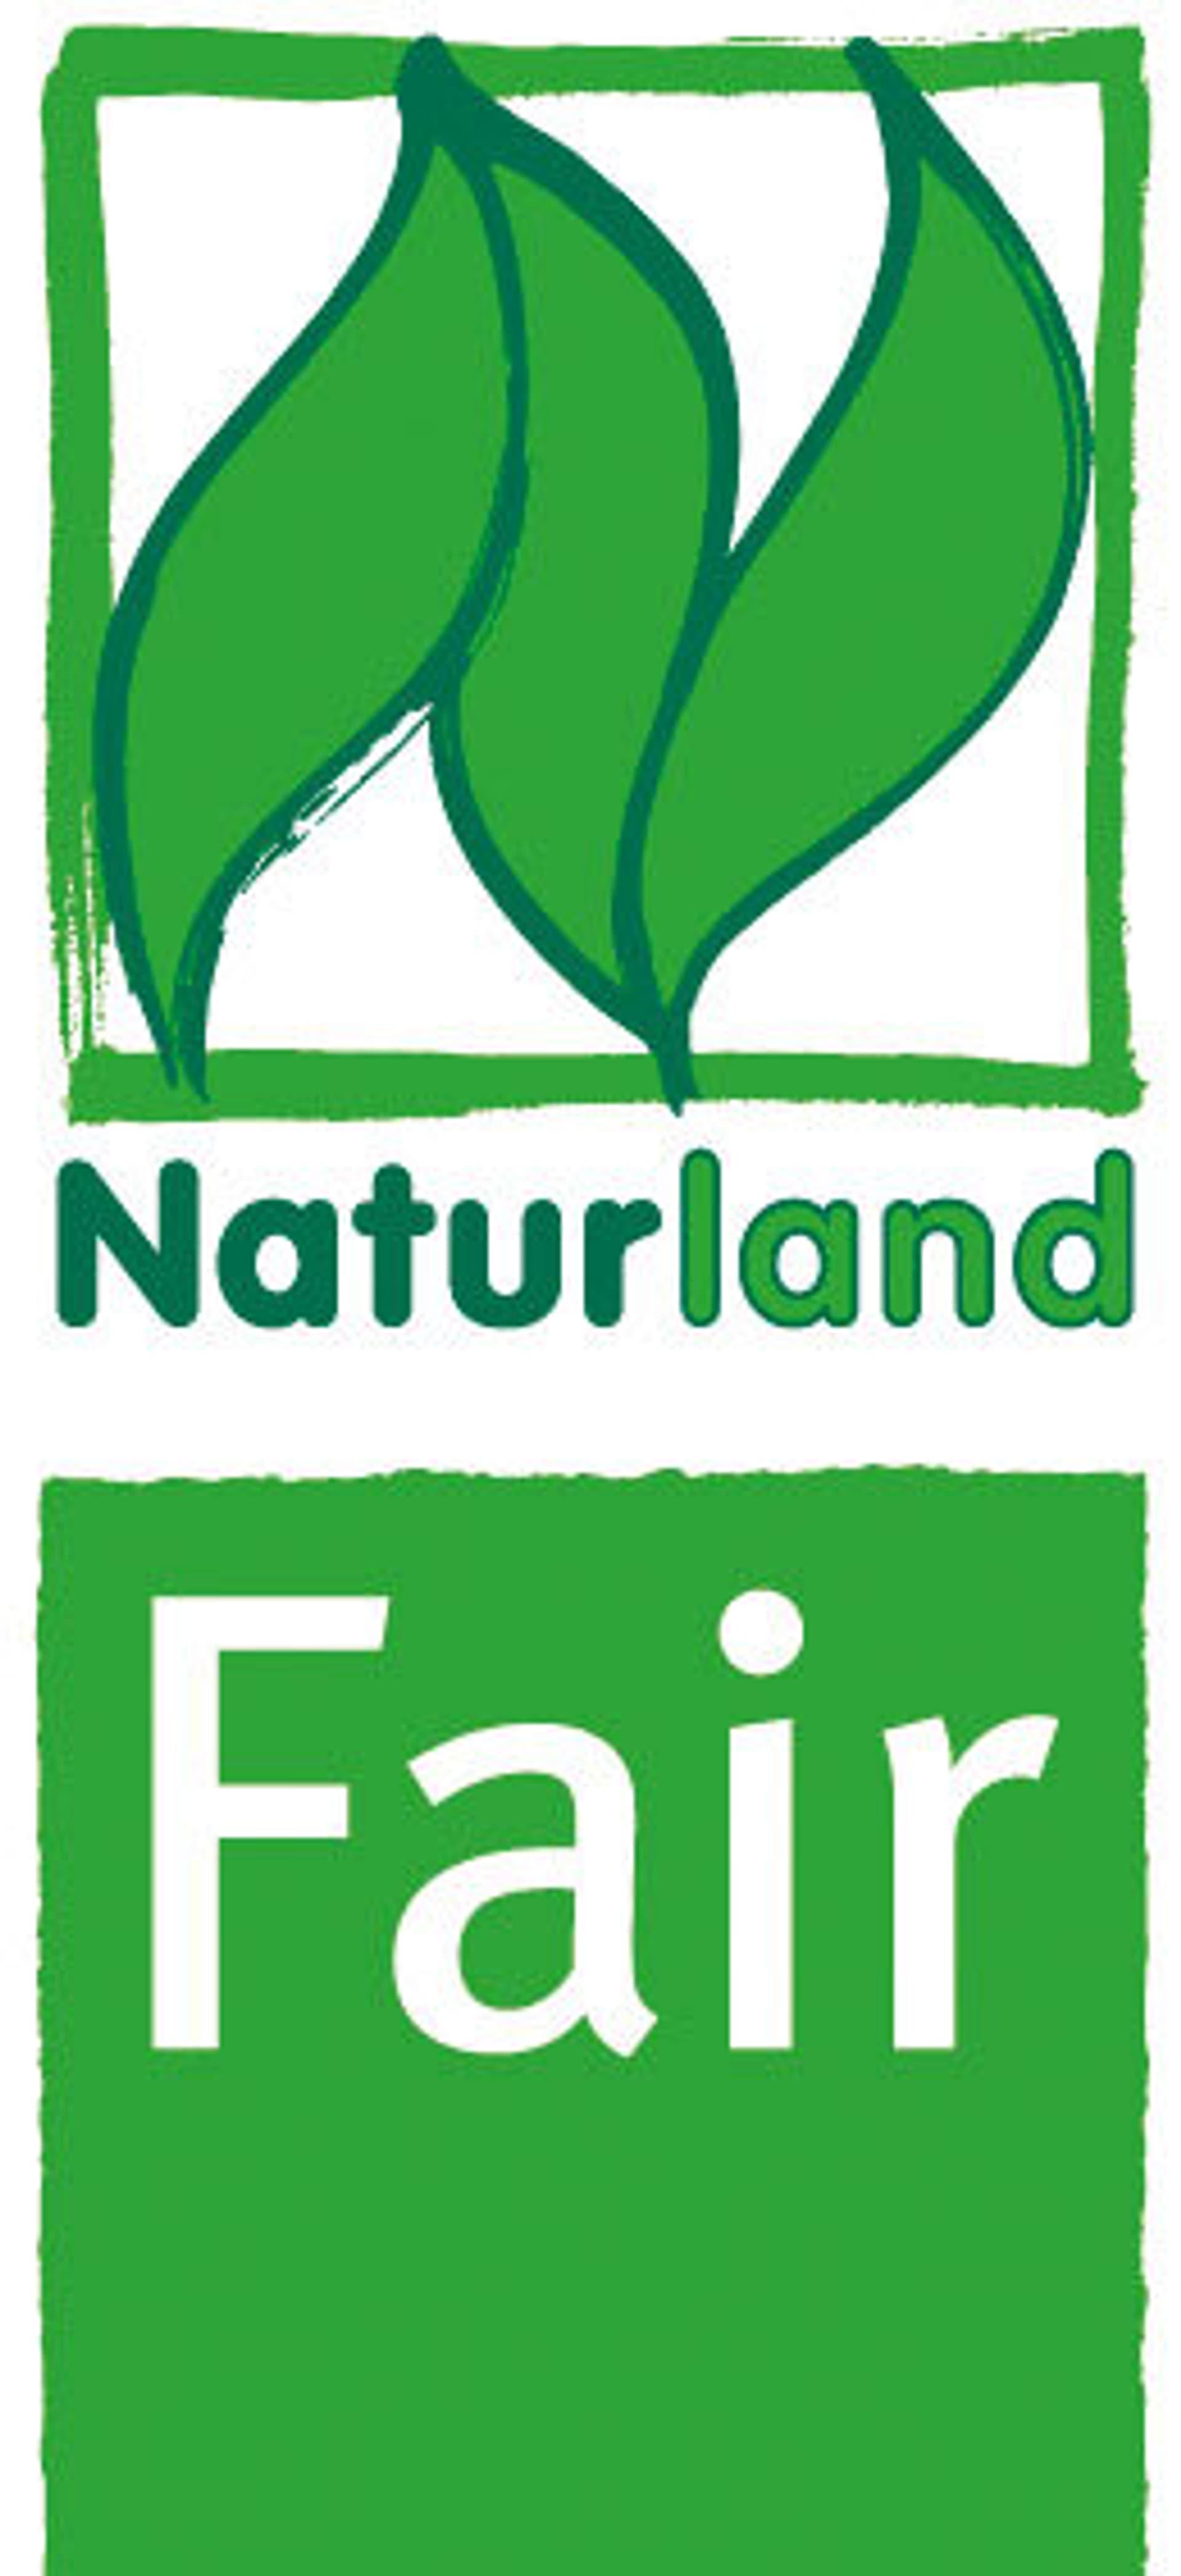 Naturland Fair Logo